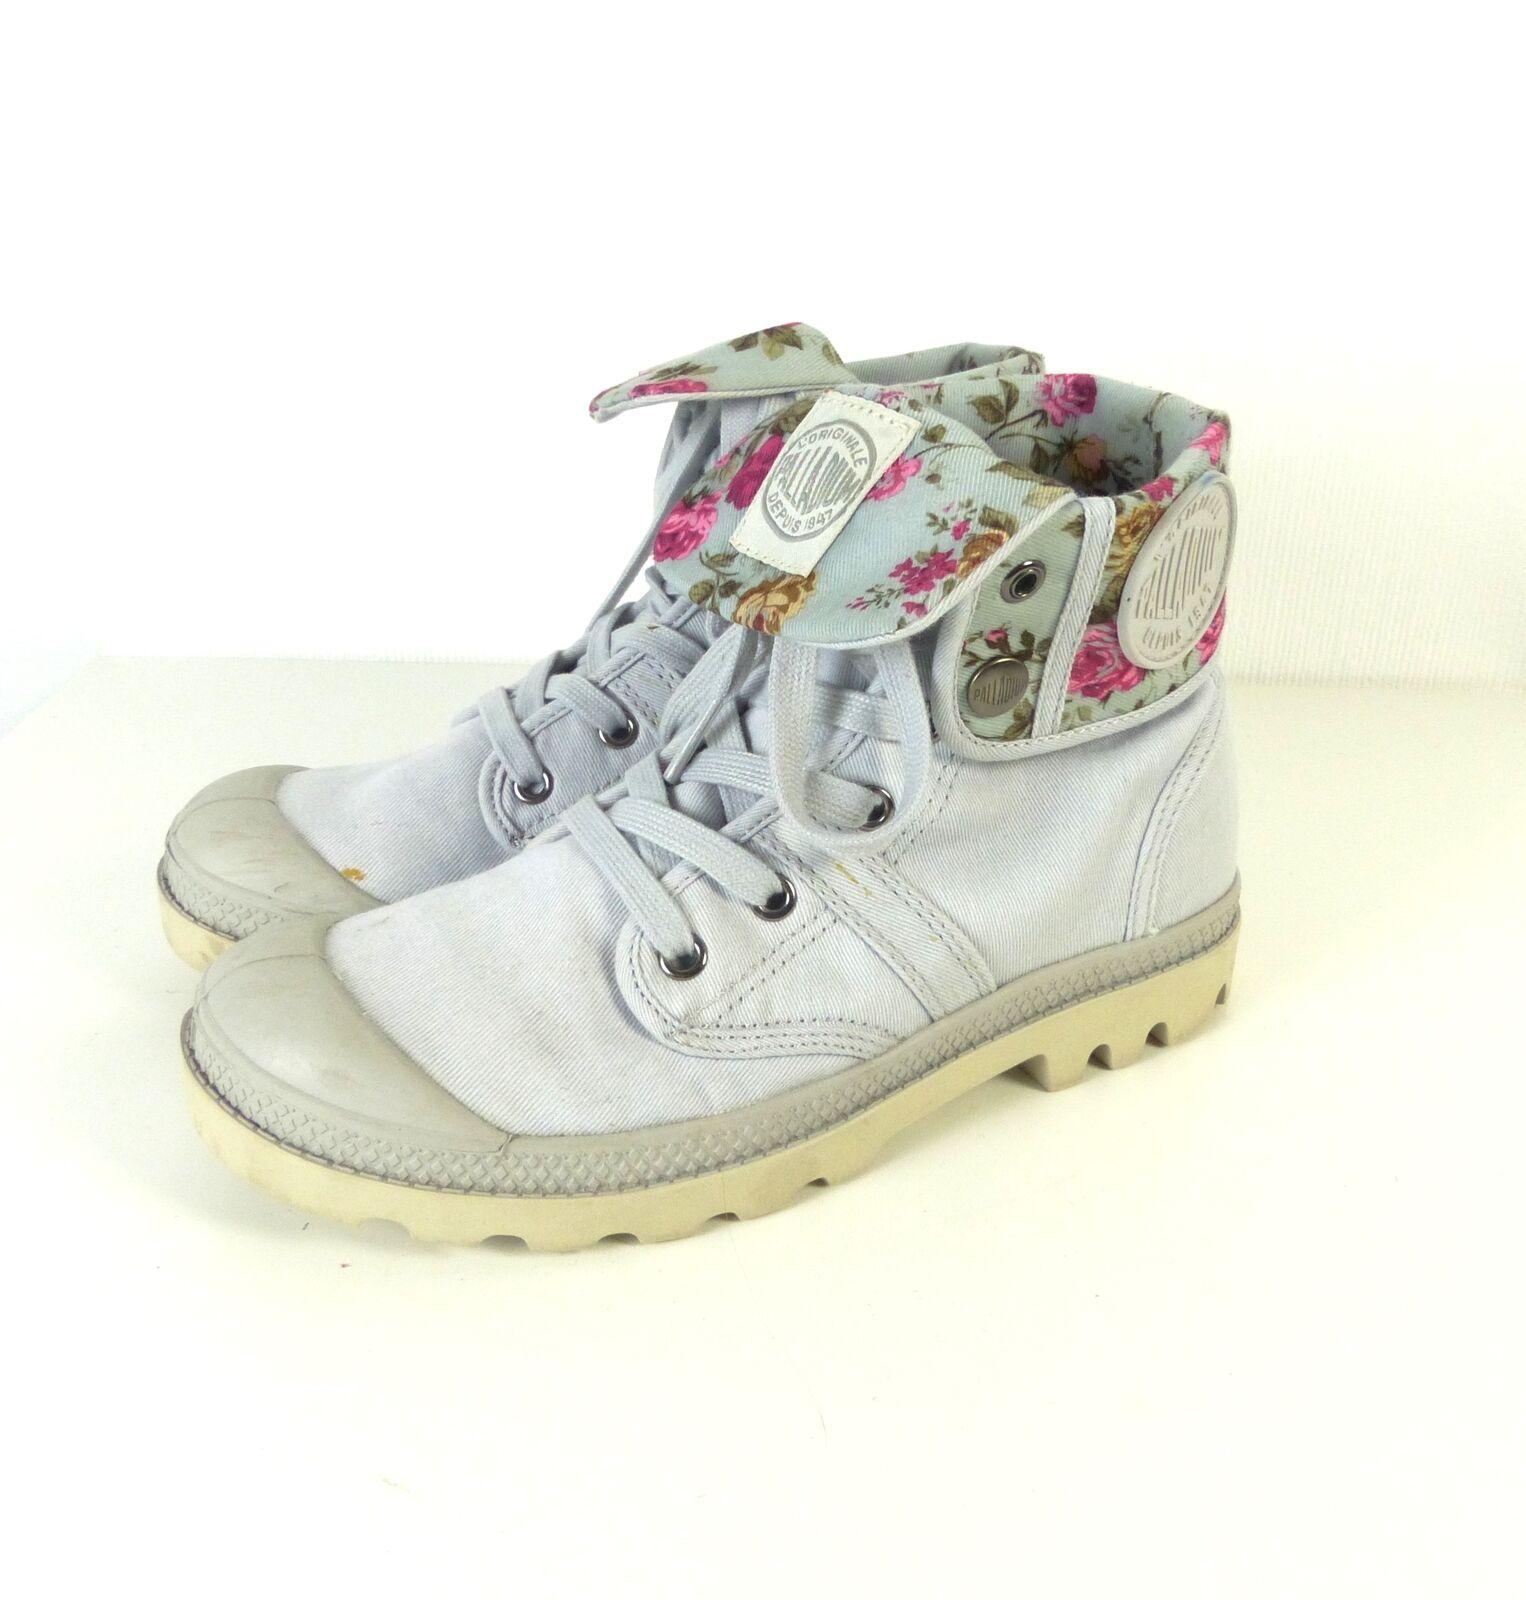 PALLADIUM High Top Sneaker Stiefel Schuhe Grau Geblümt Gr. EUR 37 (N6)